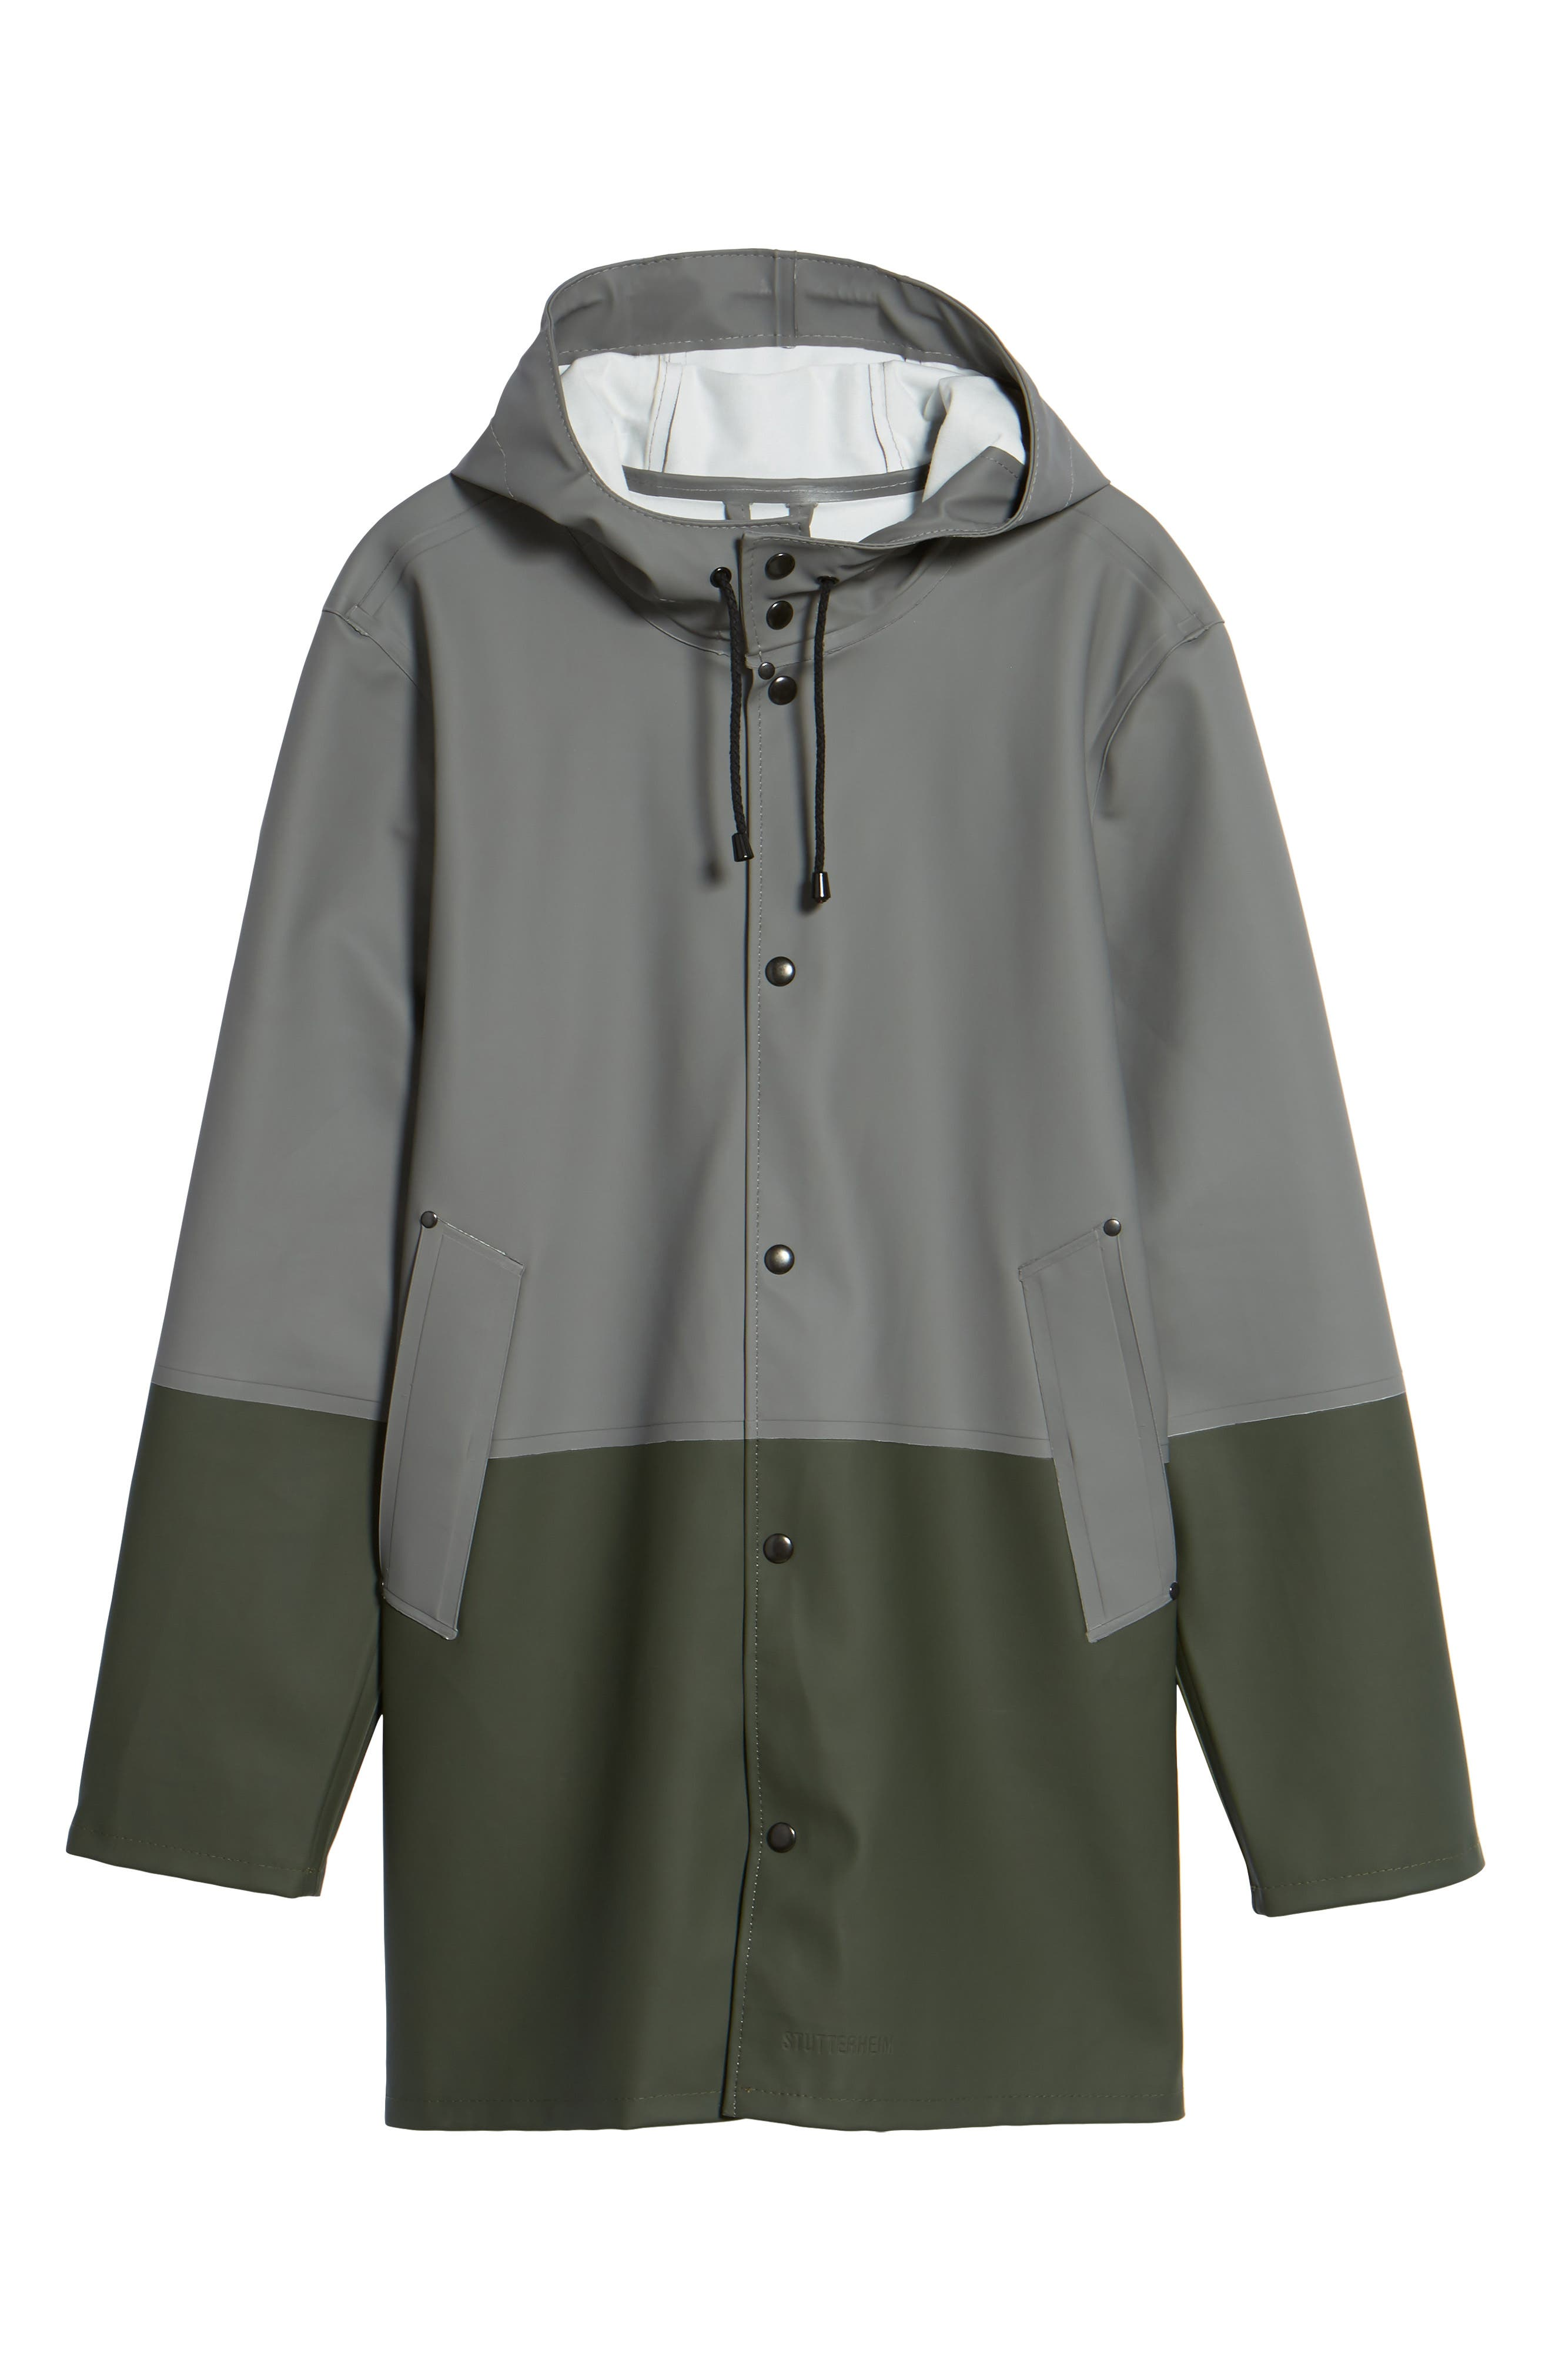 Stockholm Colorblock Waterproof Hooded Raincoat,                             Alternate thumbnail 6, color,                             Grey/ Green